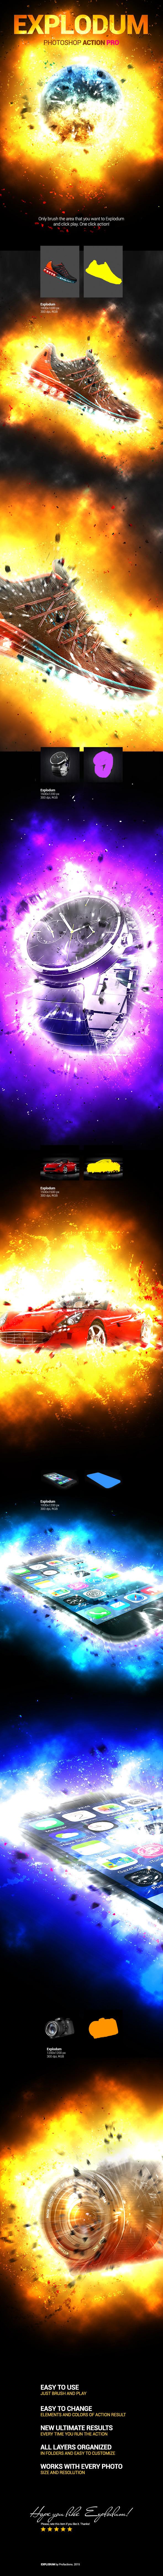 GraphicRiver Explodum PS Action 10916825